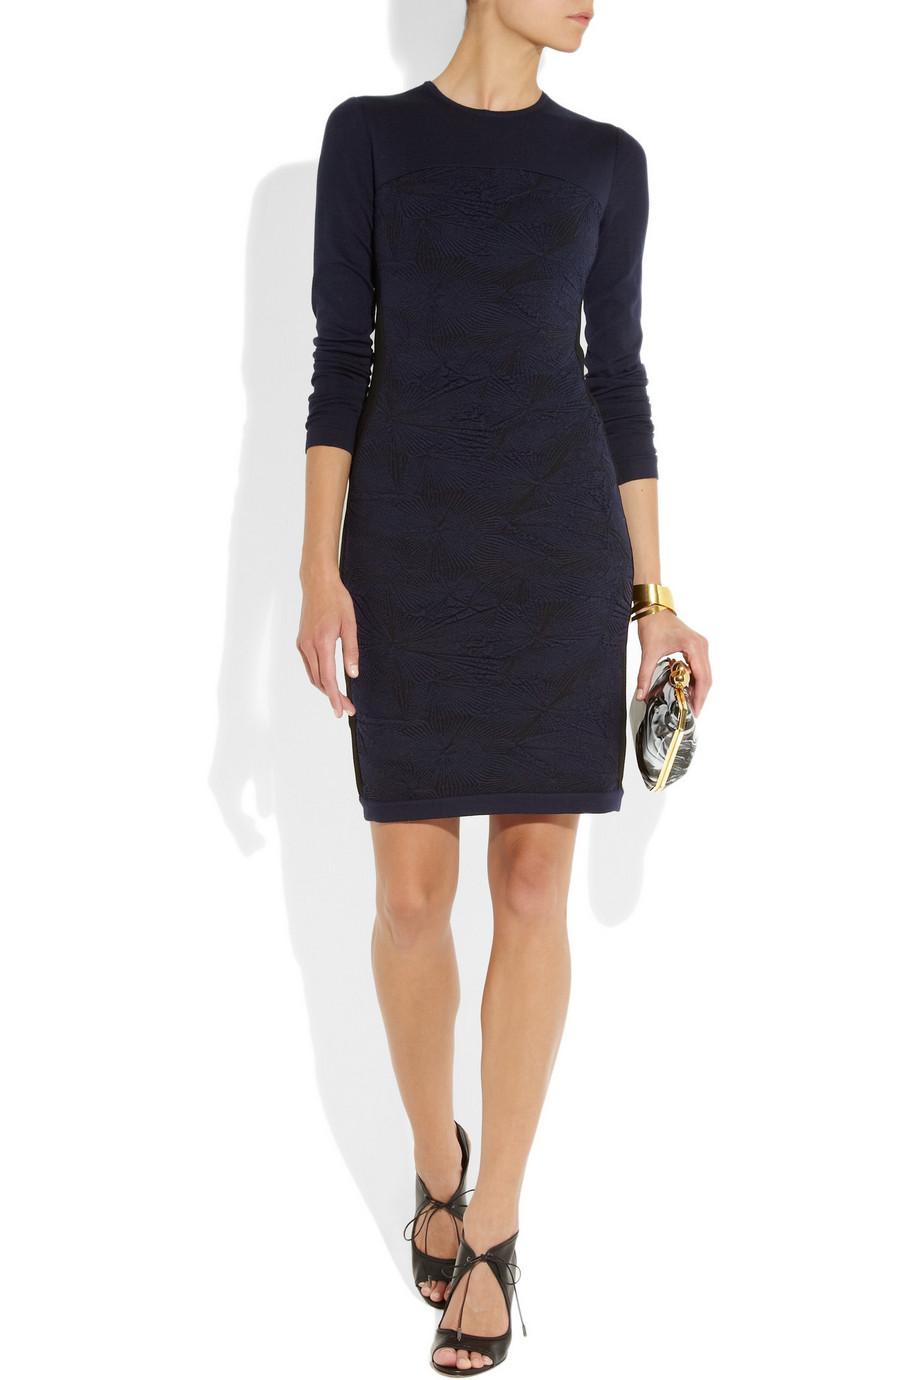 Fendi Jacquard-paneled Stretch-jersey Dress | Day to Night Dresses for Fall